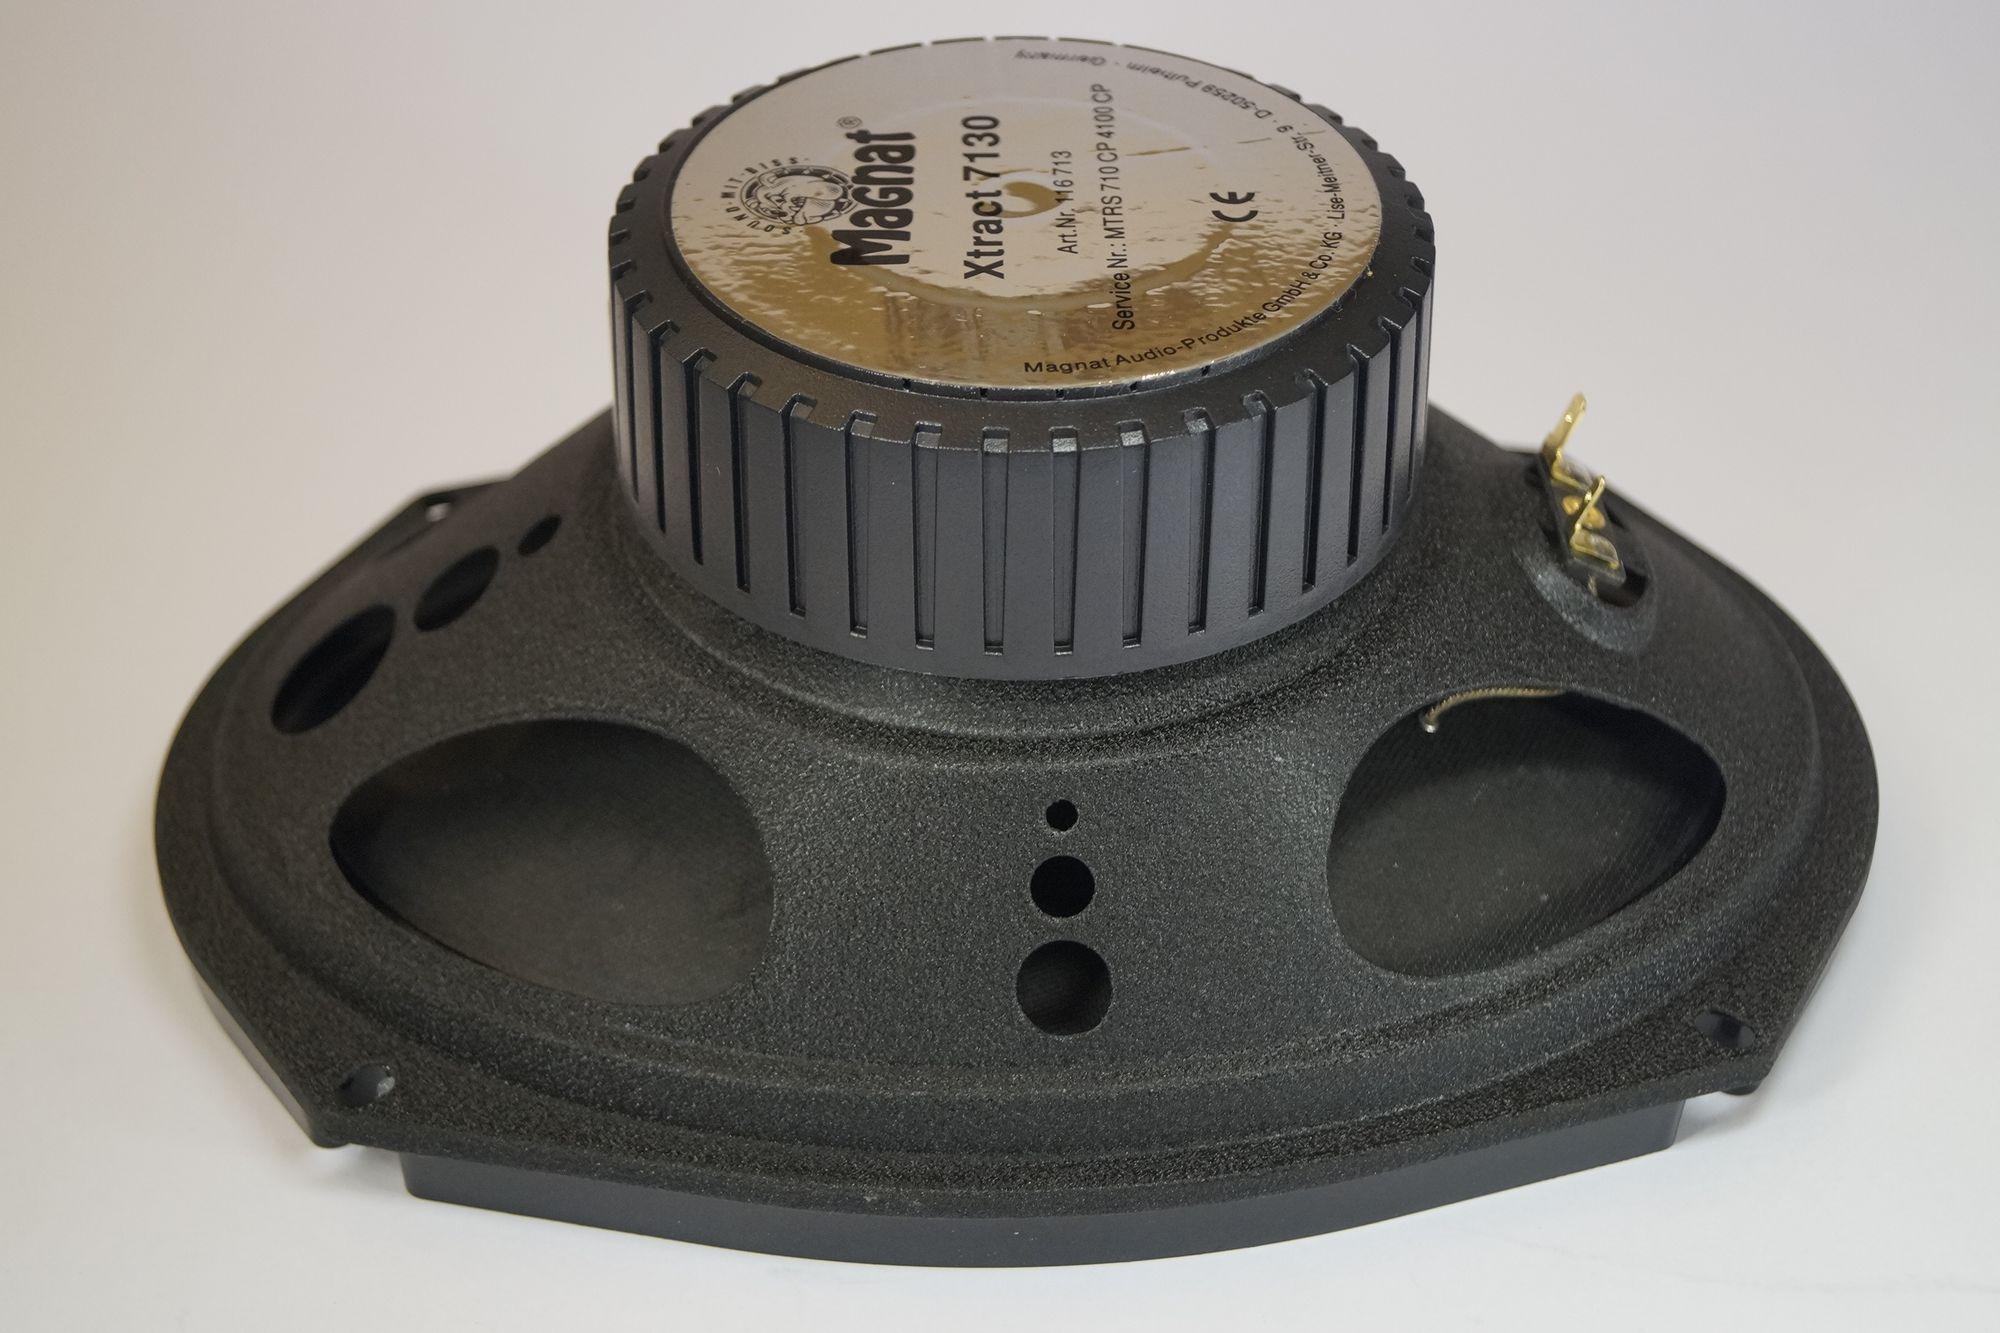 1 Paar 6x9 Lautsprecher 3-Wege Triax Magnat X-Tract 7130 – Bild 2